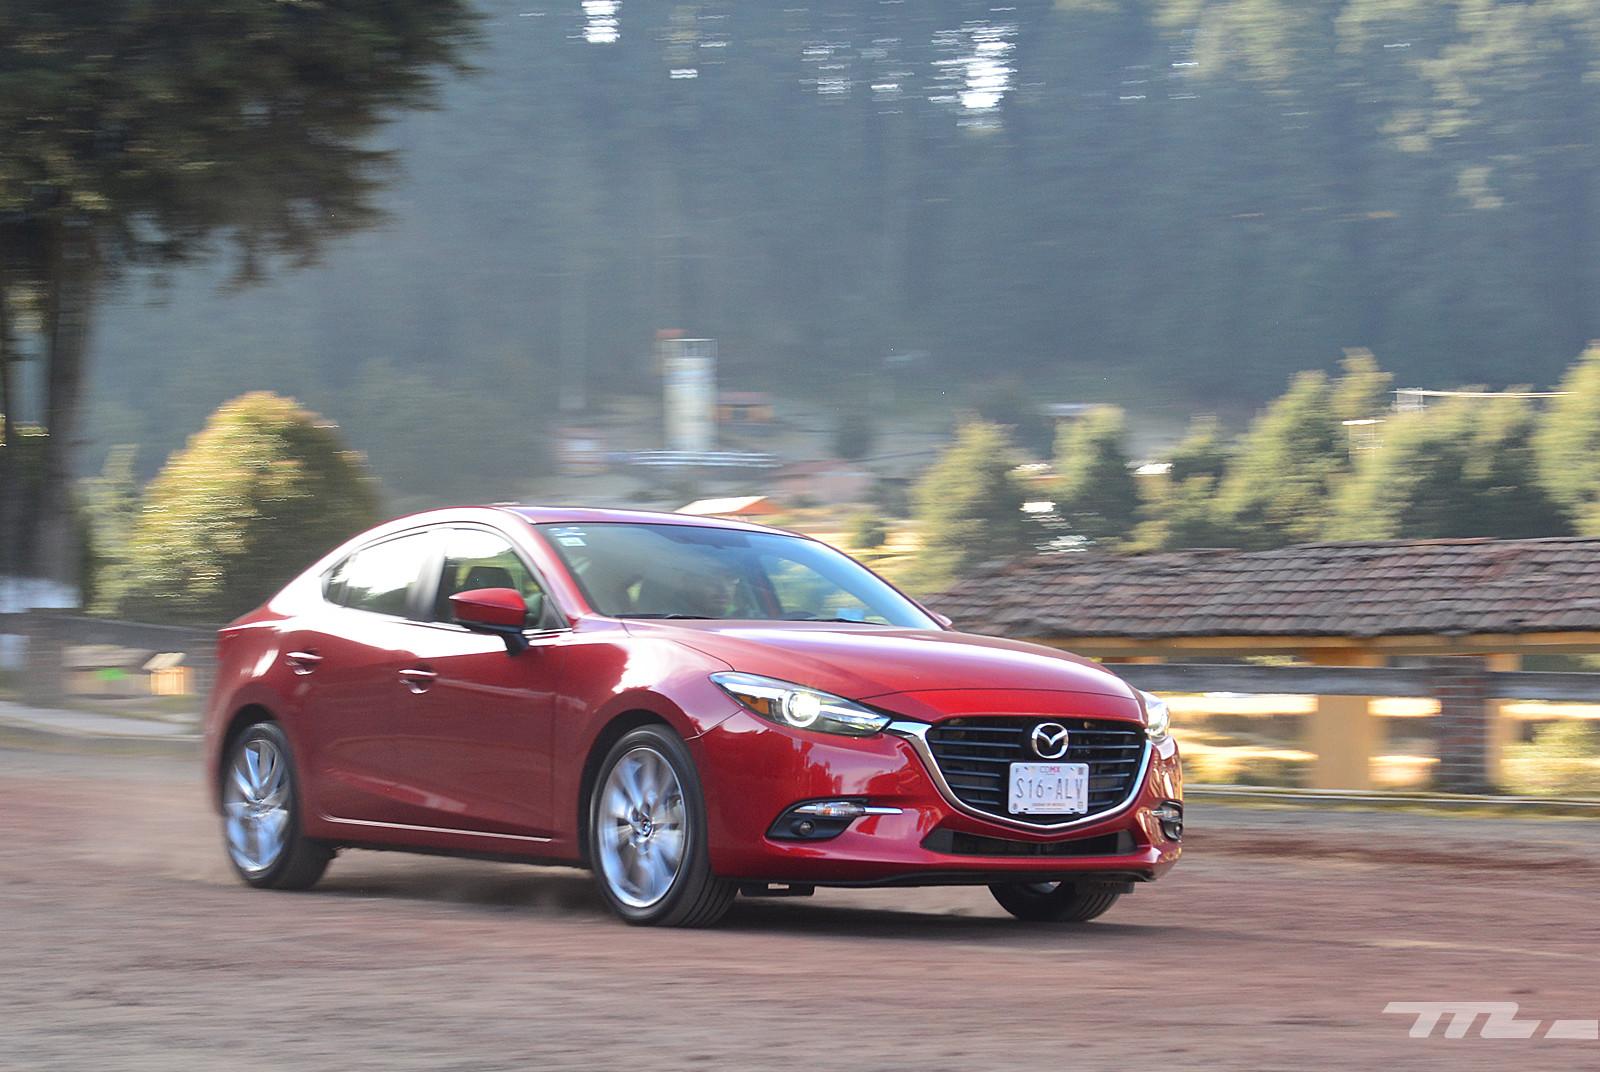 Comparativa: Mazda3 vs. Nissan Sentra vs. Toyota Corolla vs. Volkswagen Jetta